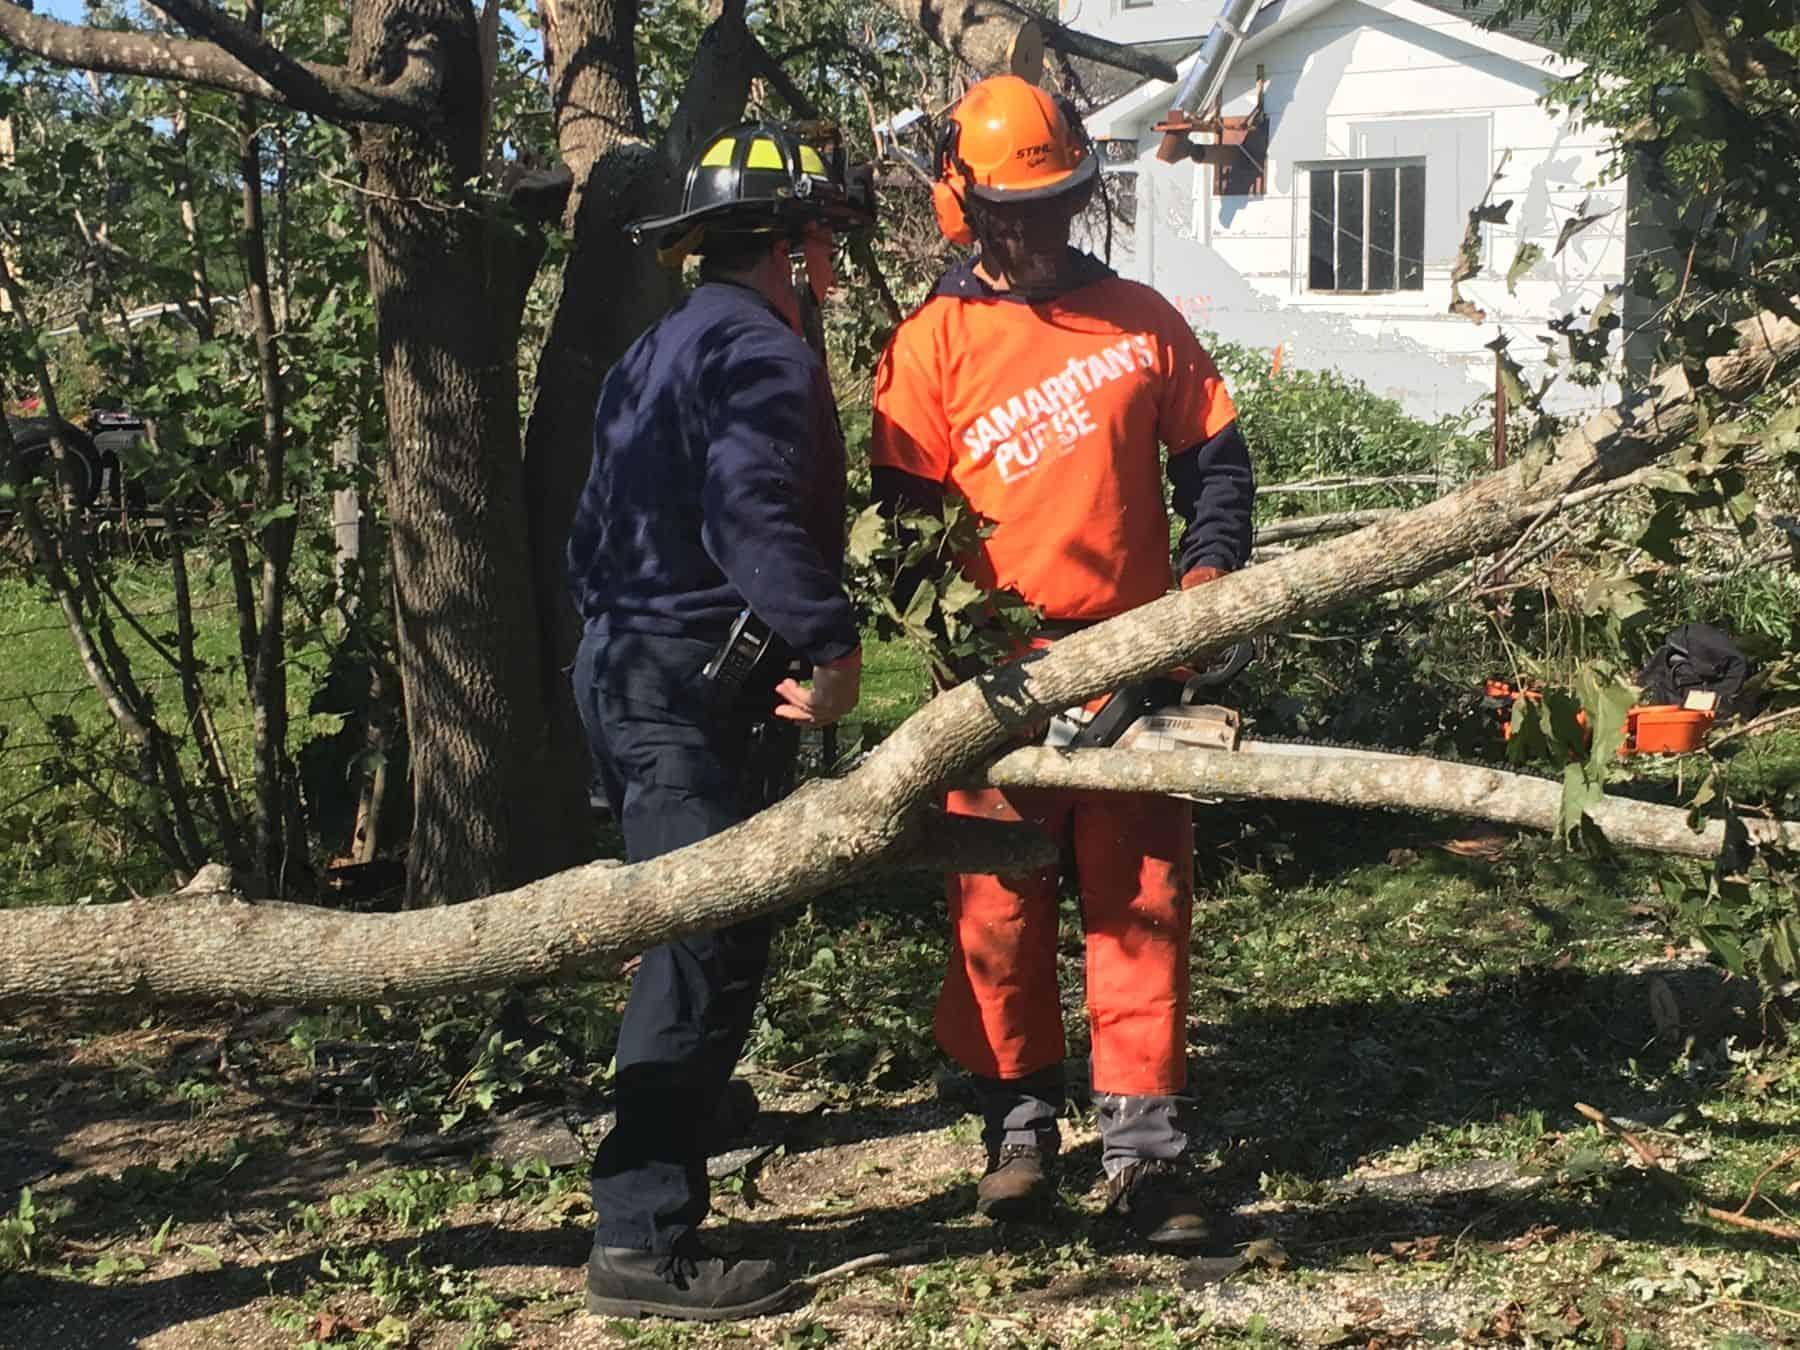 Samaritan's Purse considers it a privilege to serve alongside emergency responders.